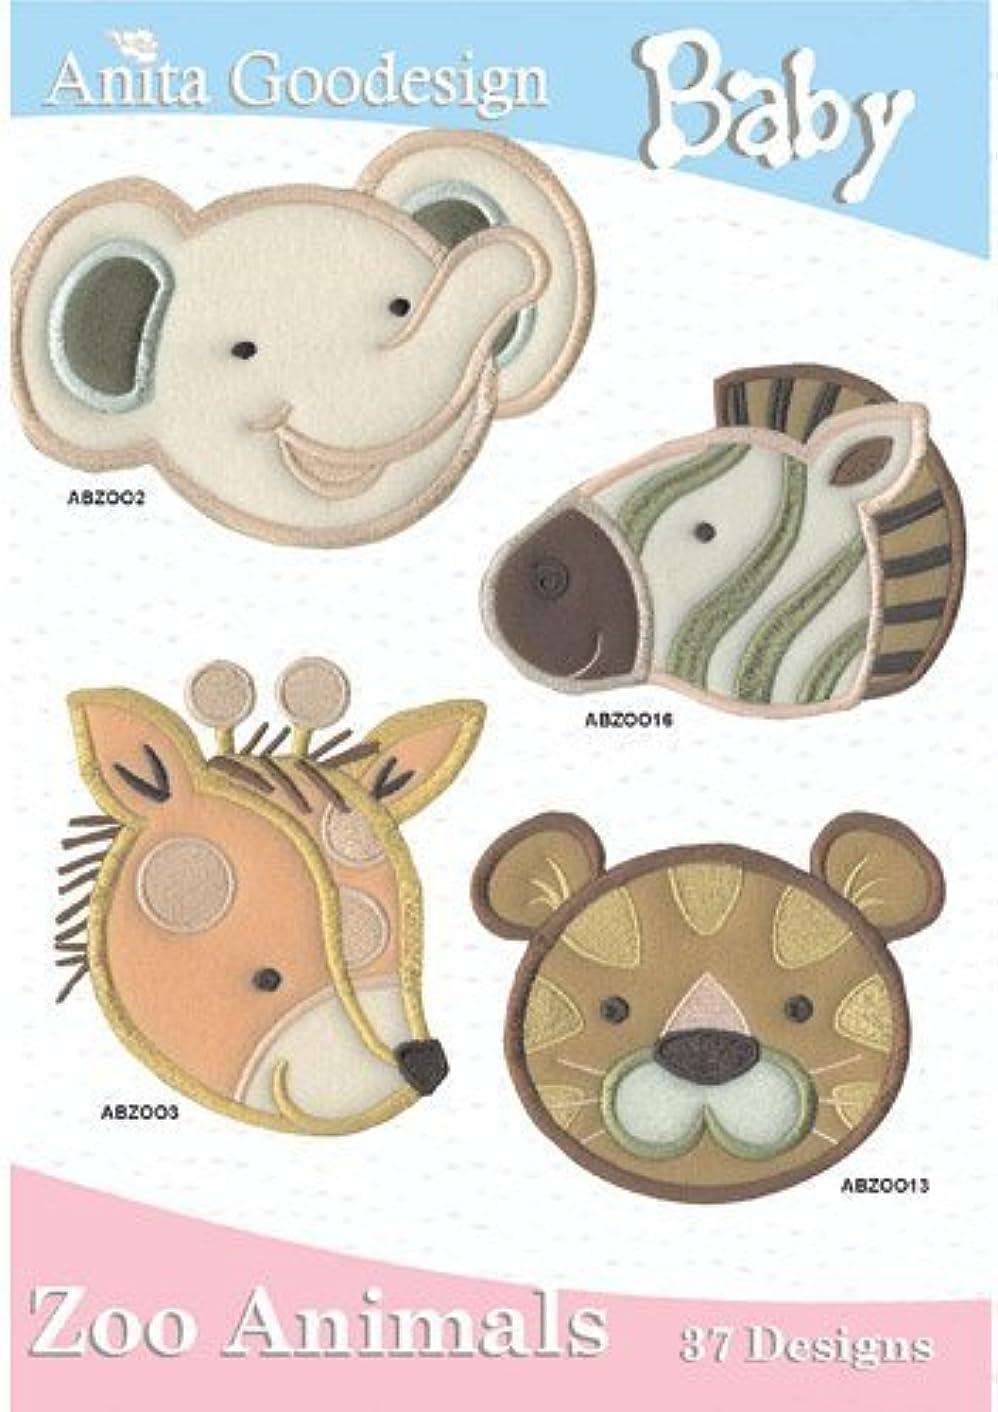 Anita Goodesign Embroidery Designs Cd Baby ZOO Animals